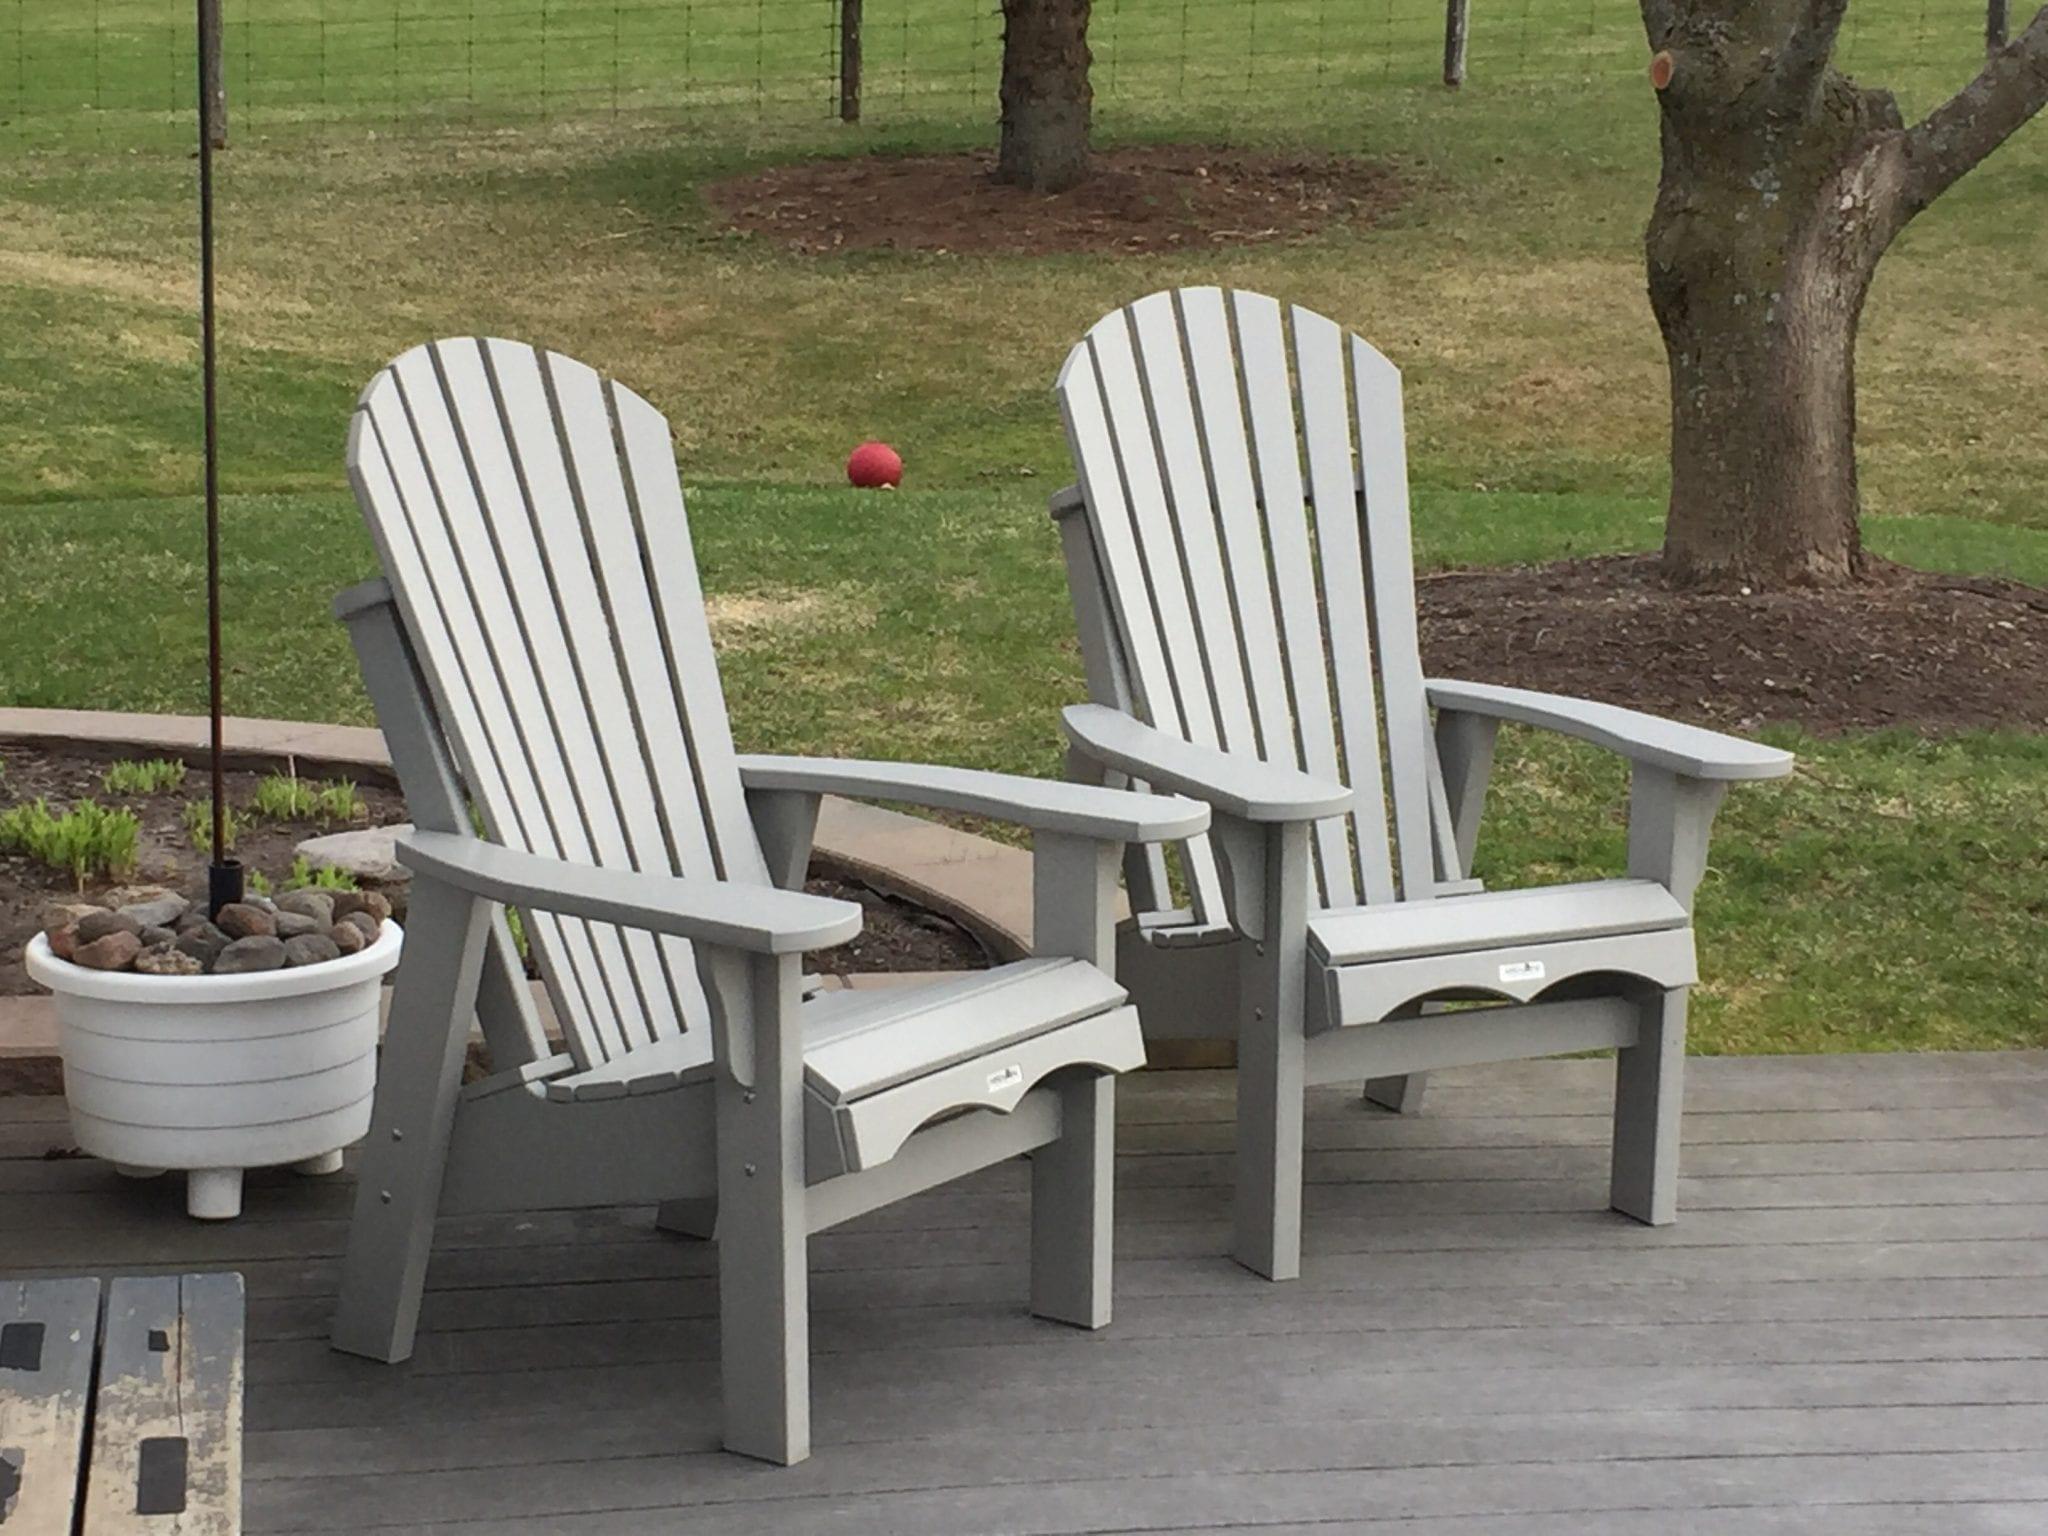 Krahn Small Adirondack Patio Chair 319 Cottage Chairs